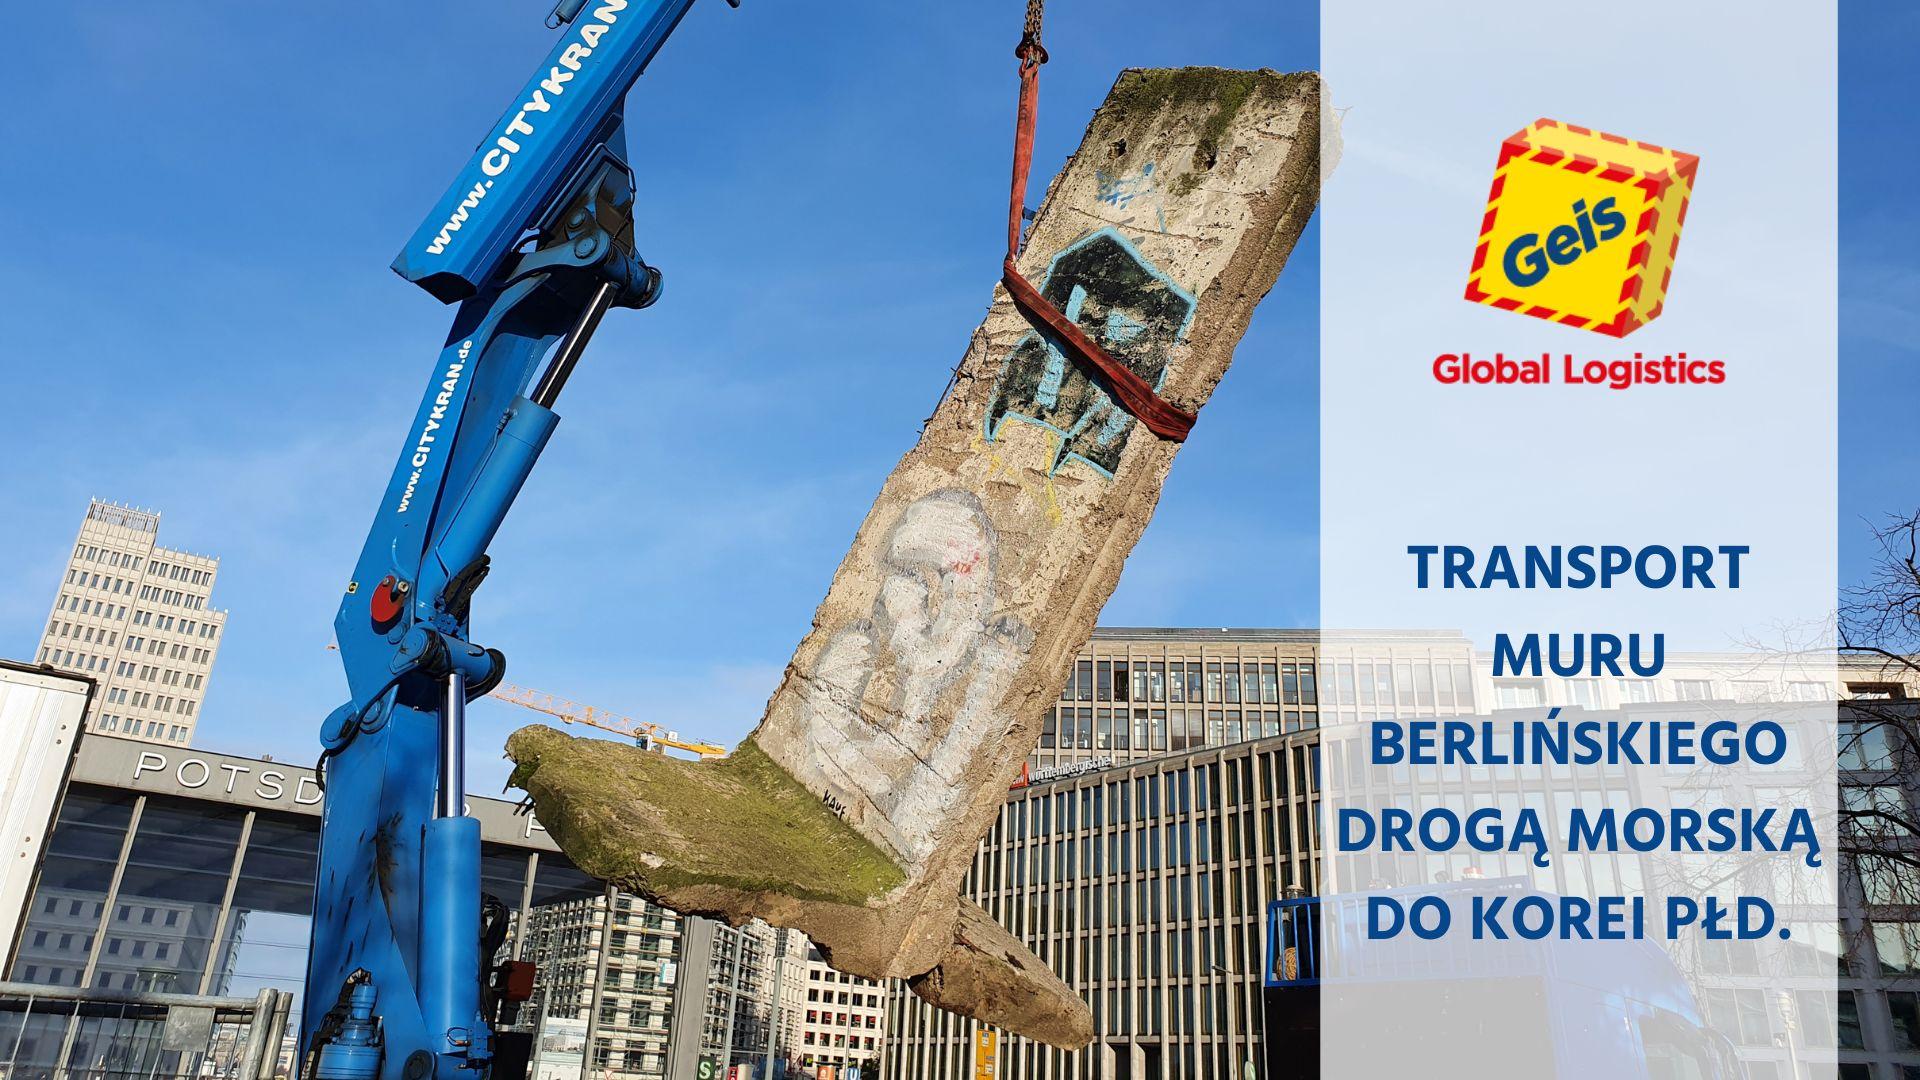 Transport Muru Berlińskiego drogą morską do Korei Południowej